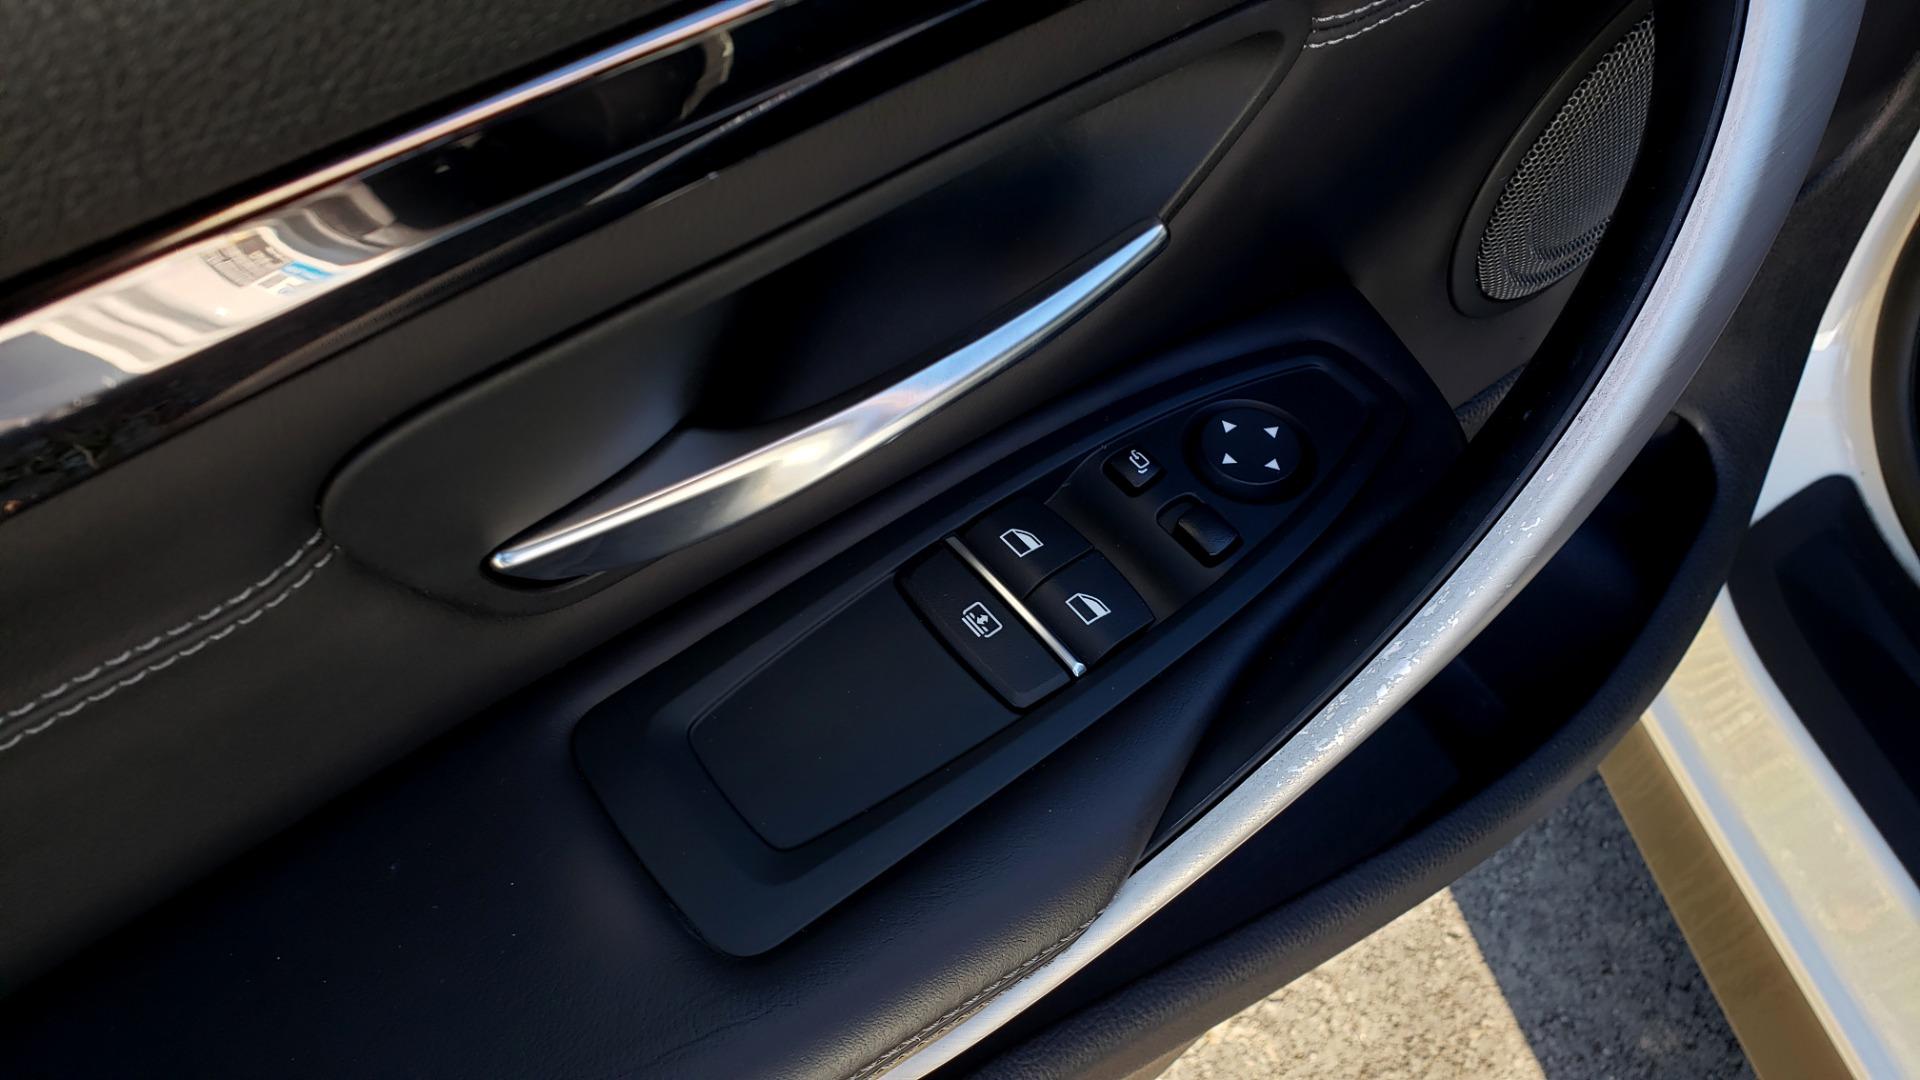 Used 2018 BMW M4 COMP PKG / EXEC / M-DRIVER / PARK CNTRL / ACTIVE BLIND SPOT for sale Sold at Formula Imports in Charlotte NC 28227 34